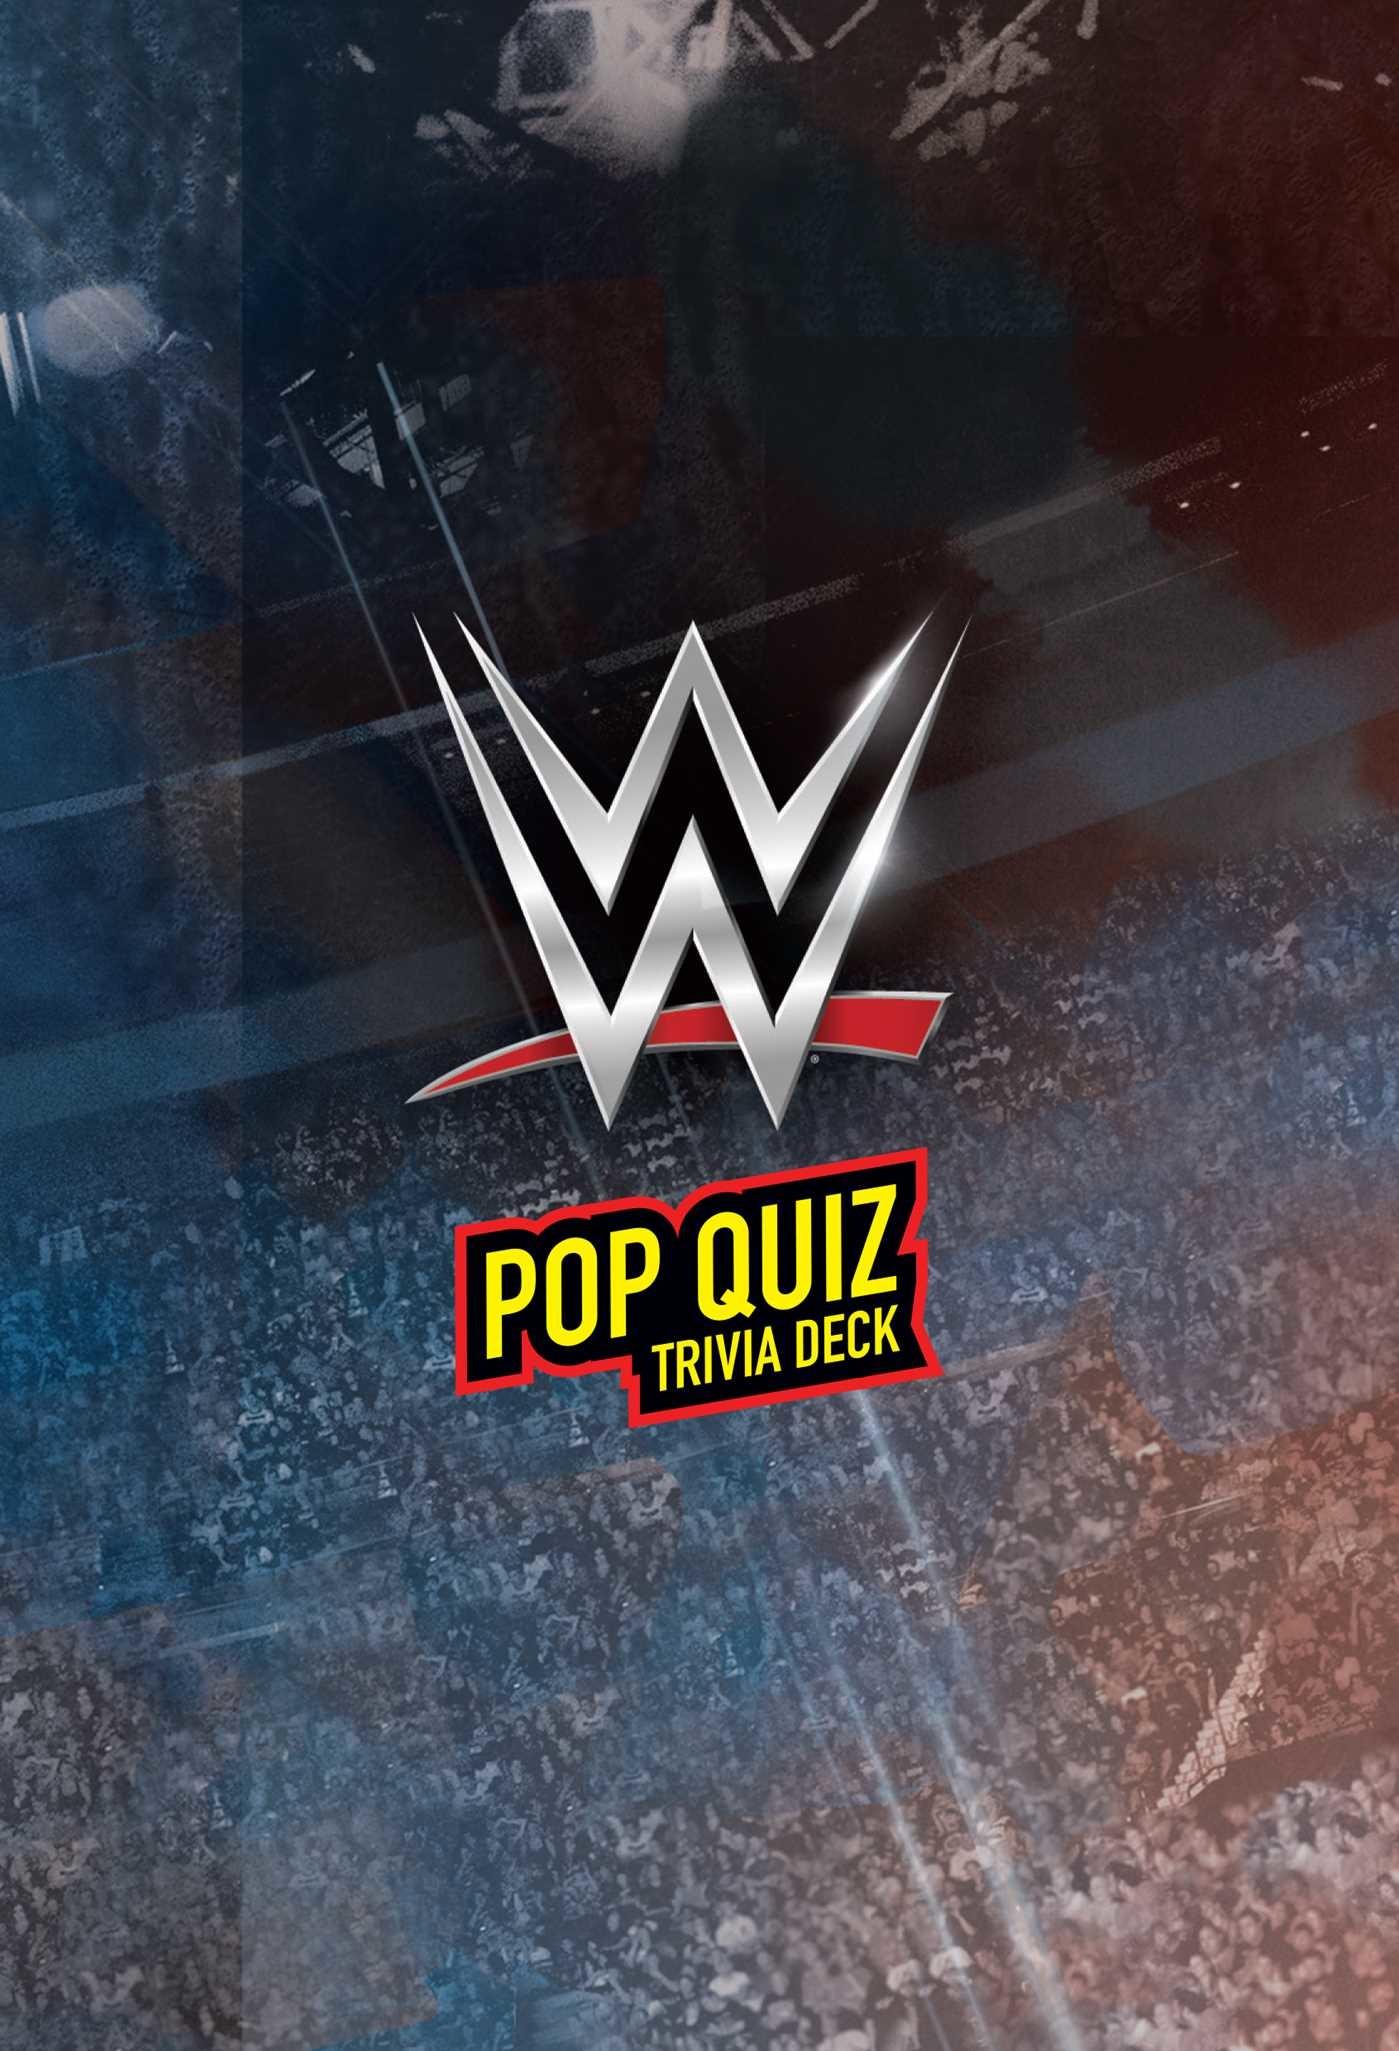 Wwe pop quiz trivia deck 9781683834410.in02